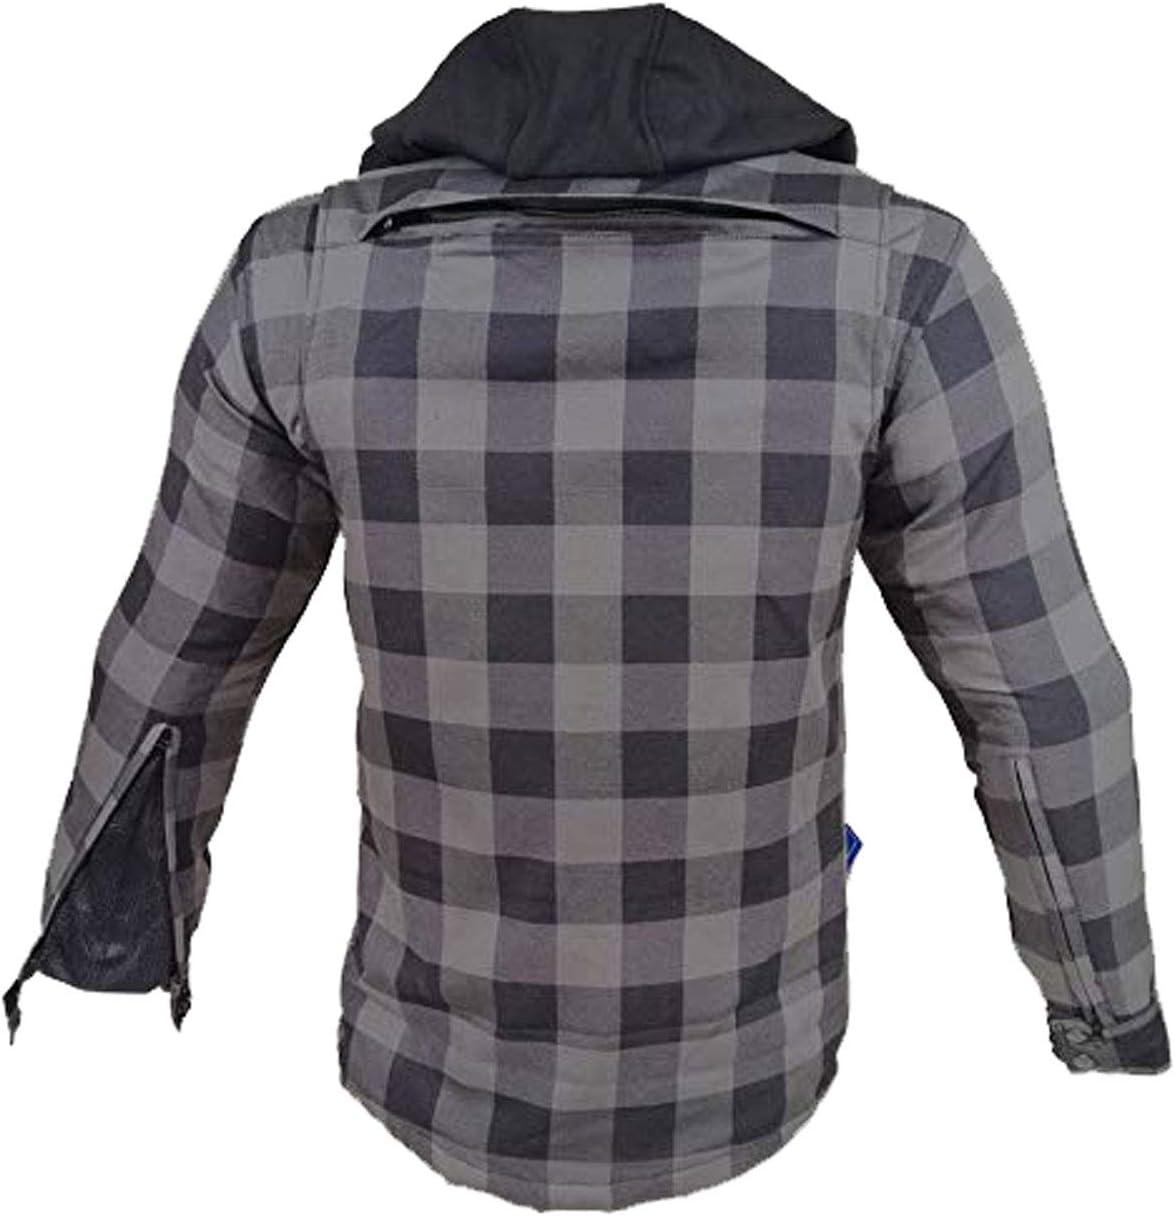 EURO STARS Motorrad XS und Flanell-Holzf/ällerhemd mit KEV ARAMID Lumber Biker Jacke Grau Hemd